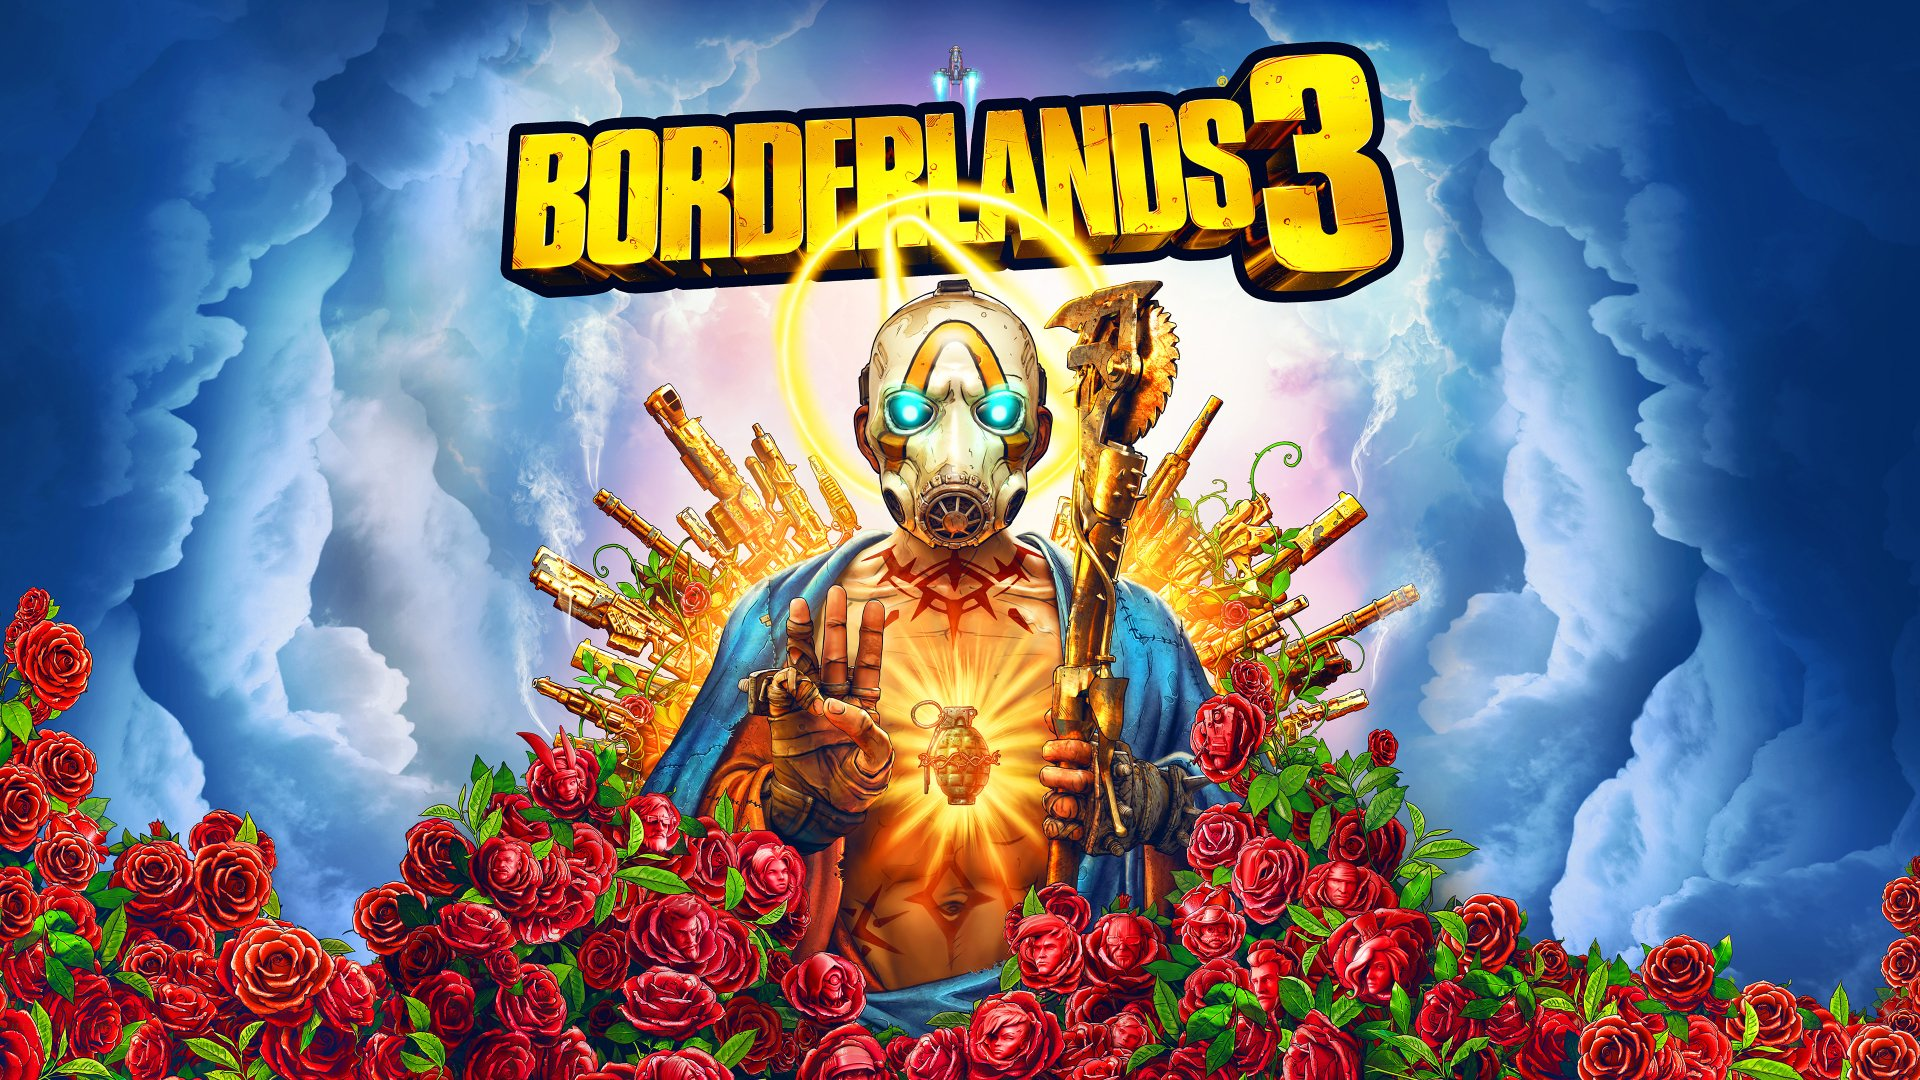 .Borderlands 3